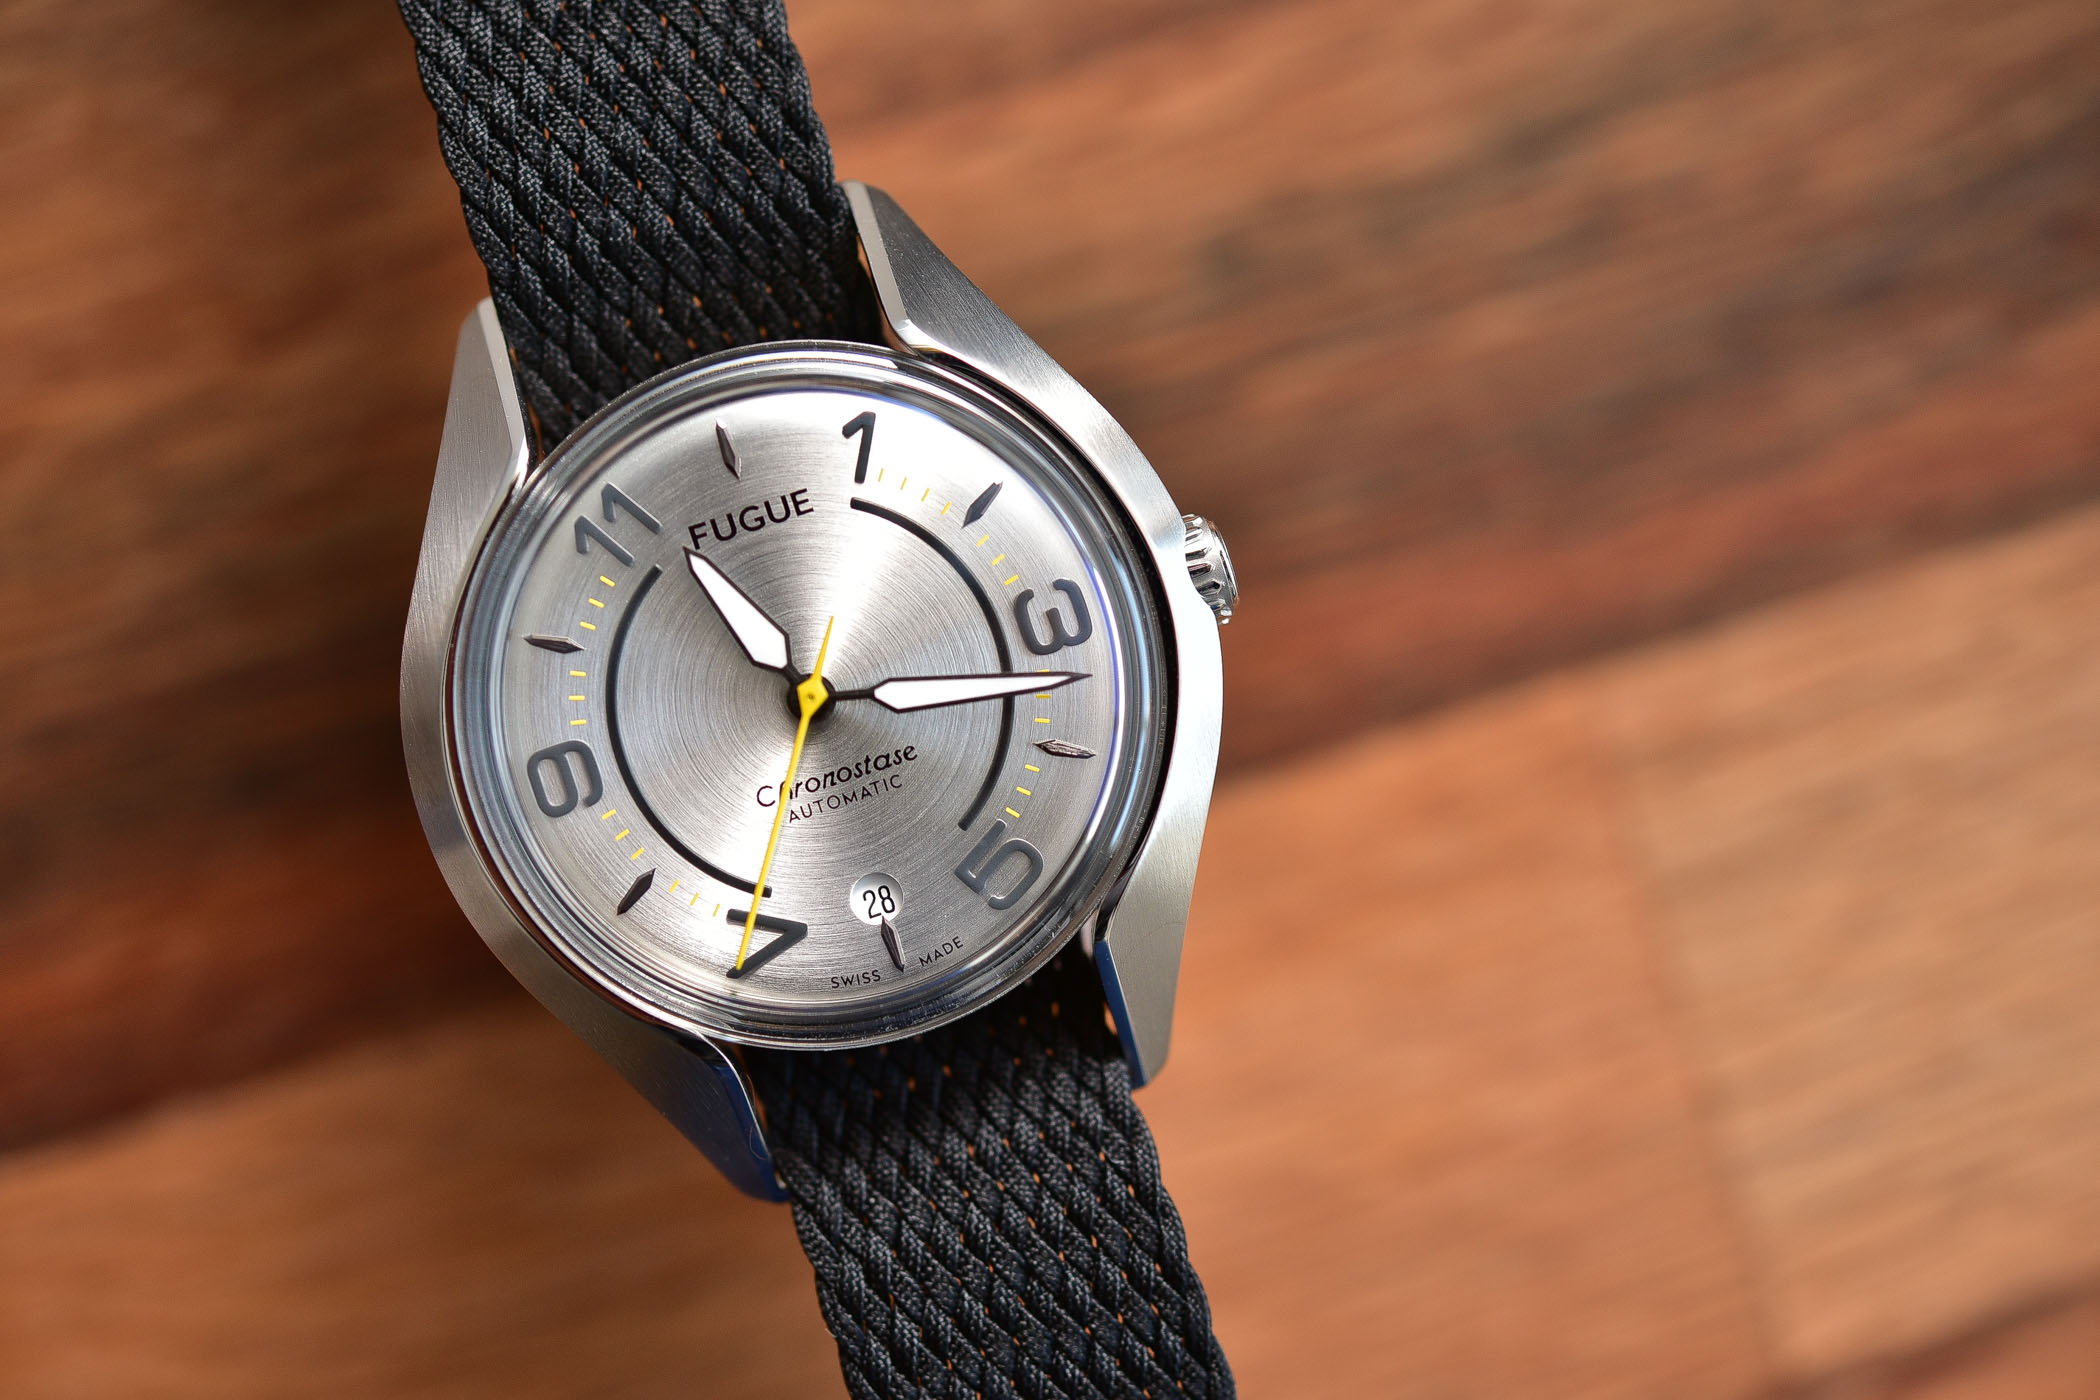 Fugue Watch Chronostase modular watch interchangeable case and strap - 6